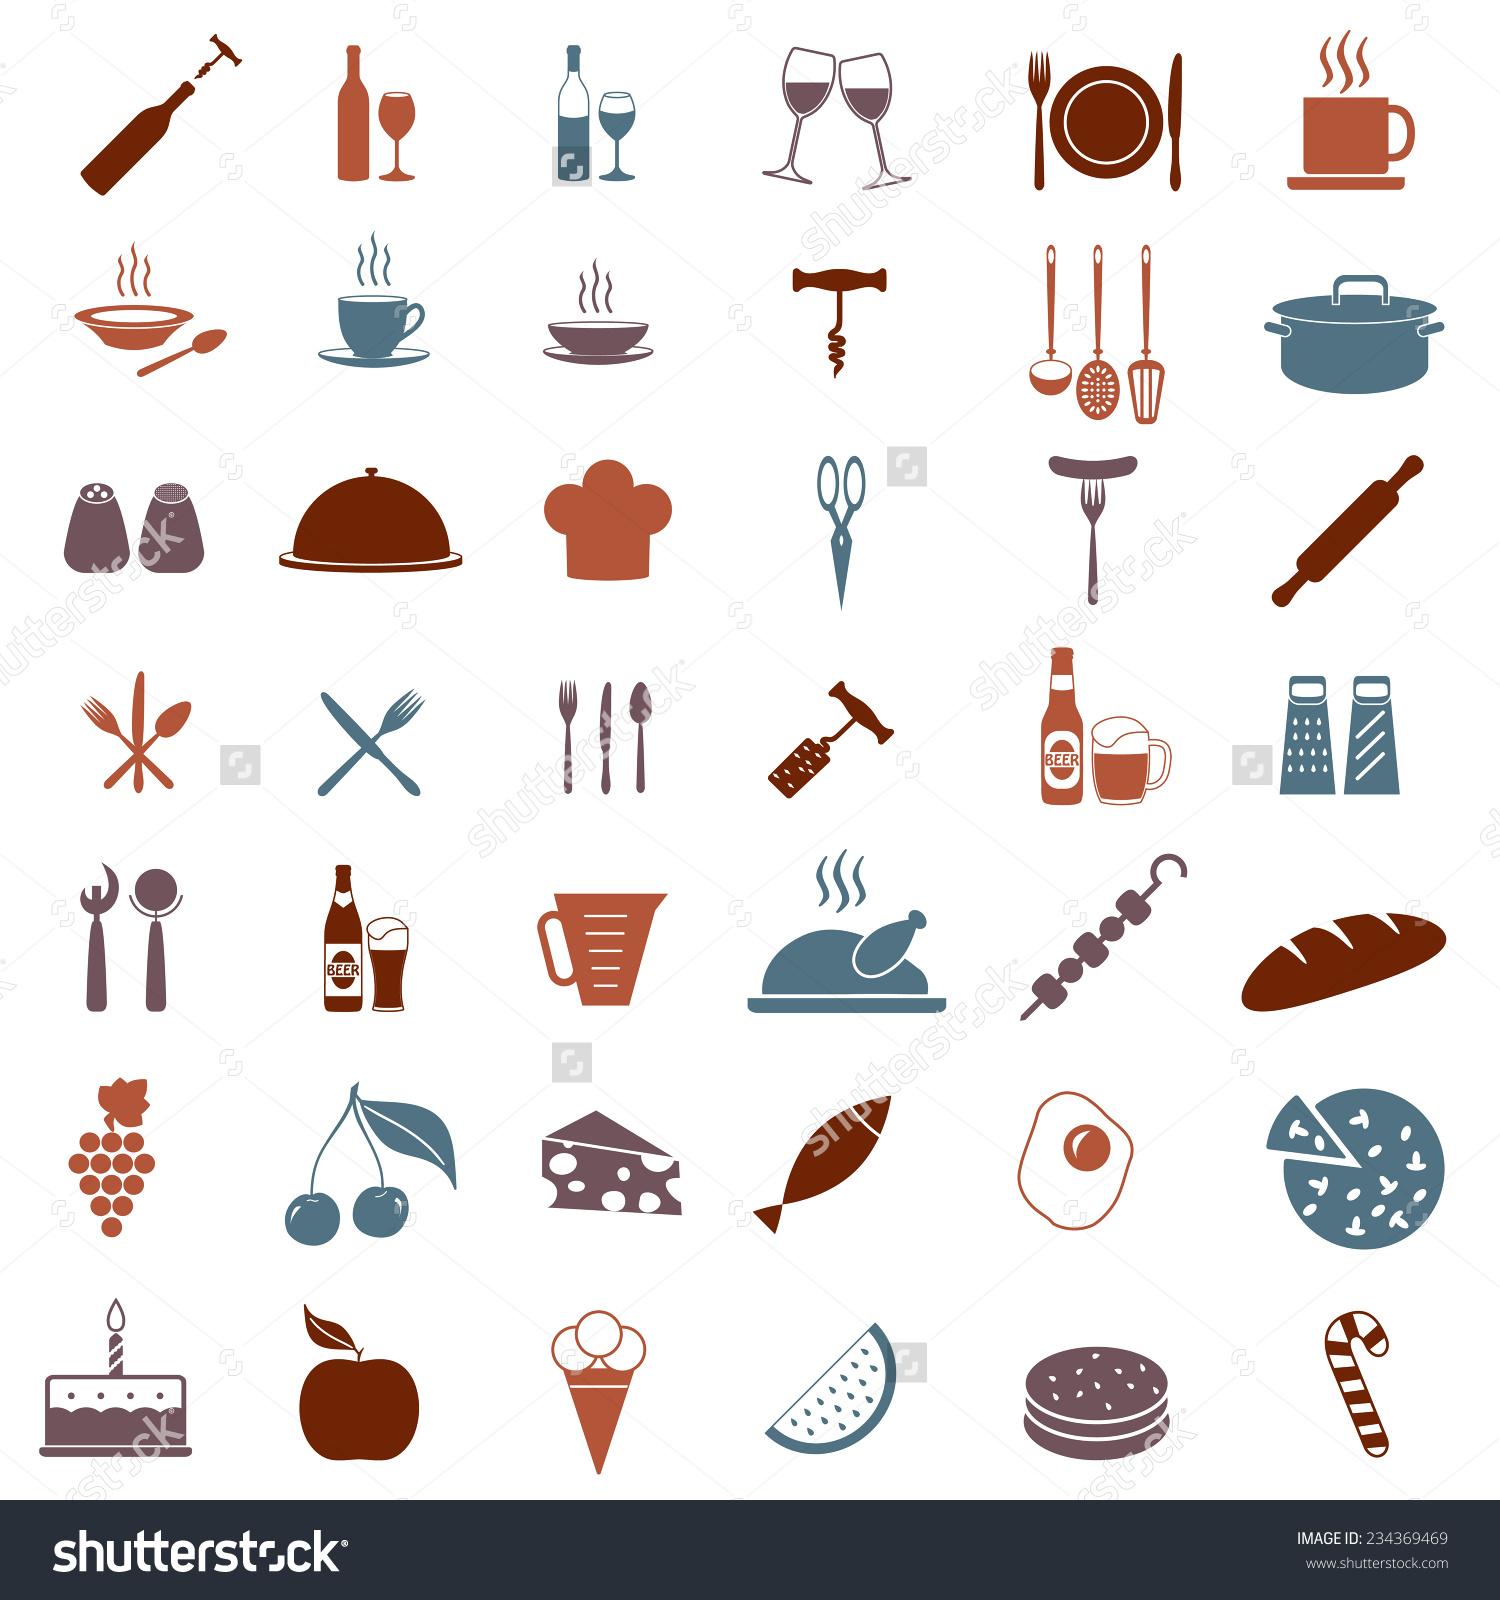 Restaurant Kitchen Utensils: Kitchen Tools And Equipment Clipart